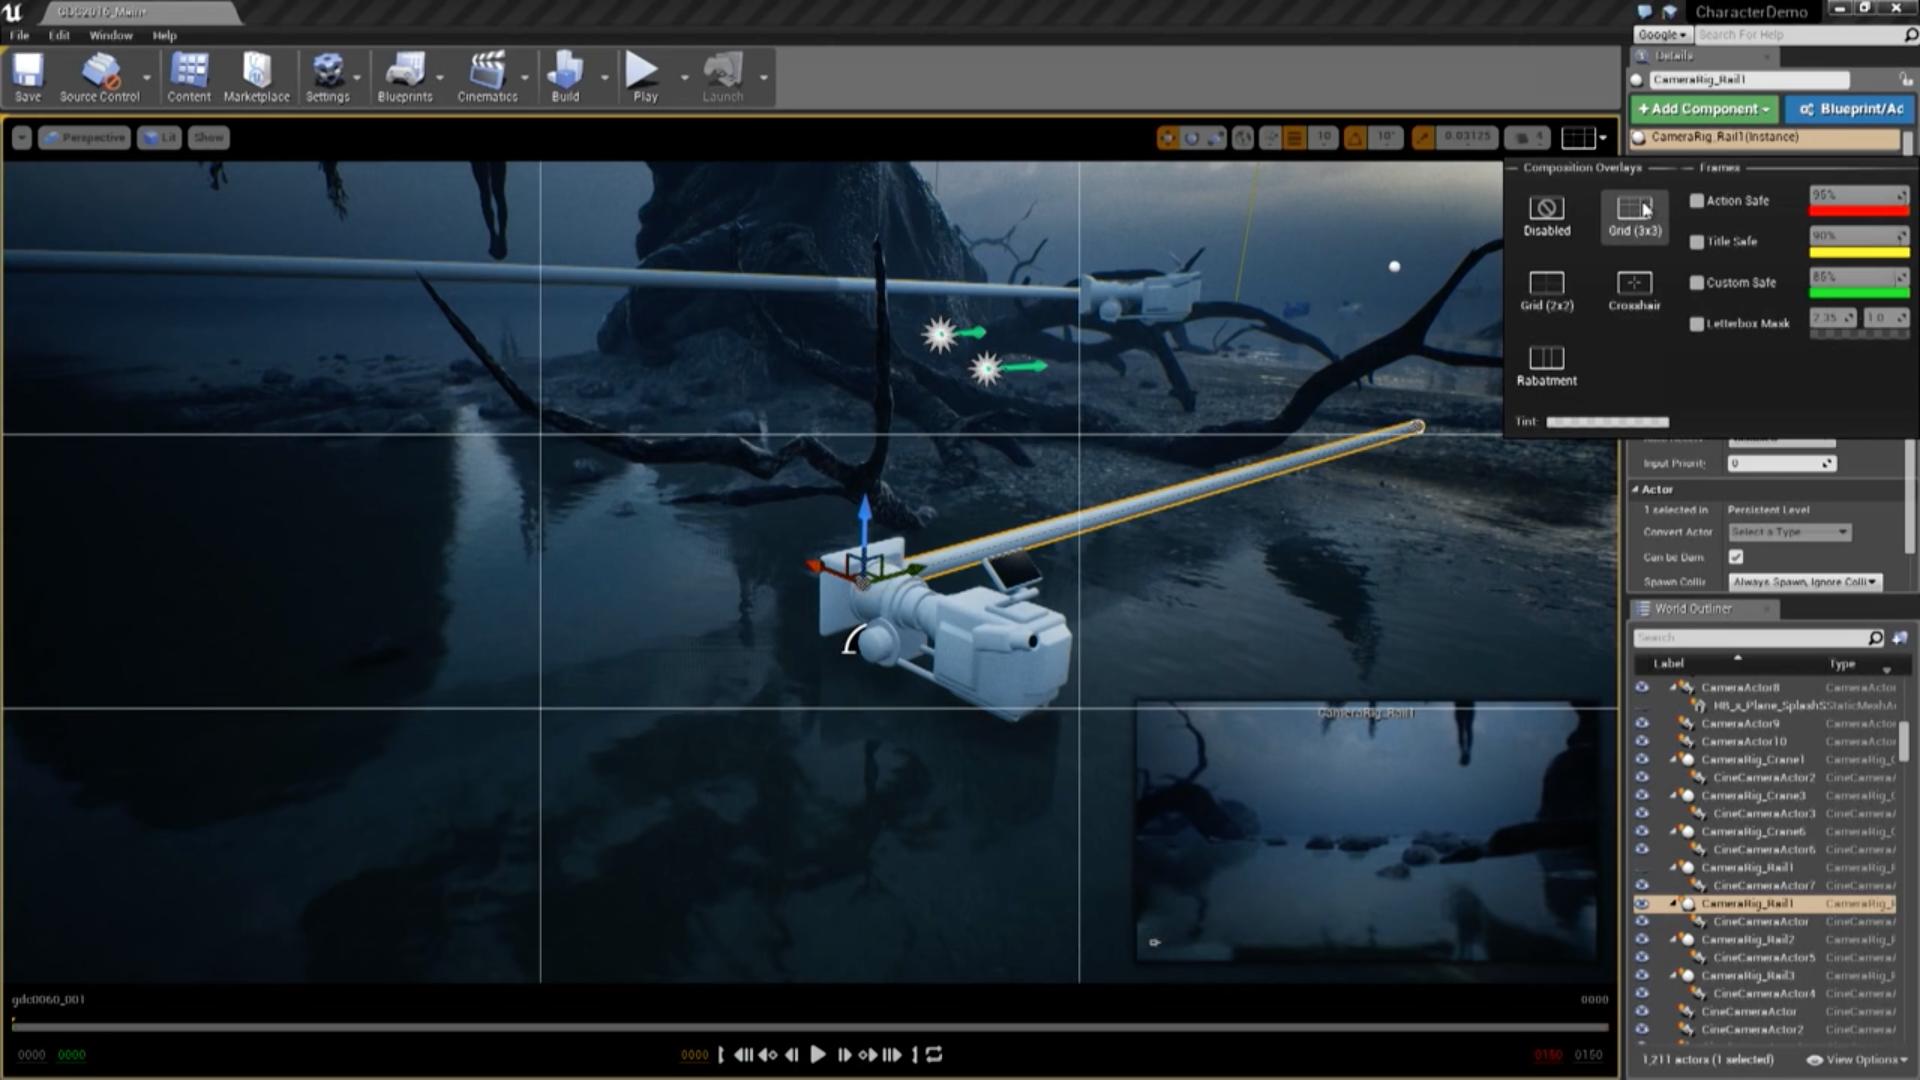 UE4 Sequencer Cinematic Tool – Cutscene Artist